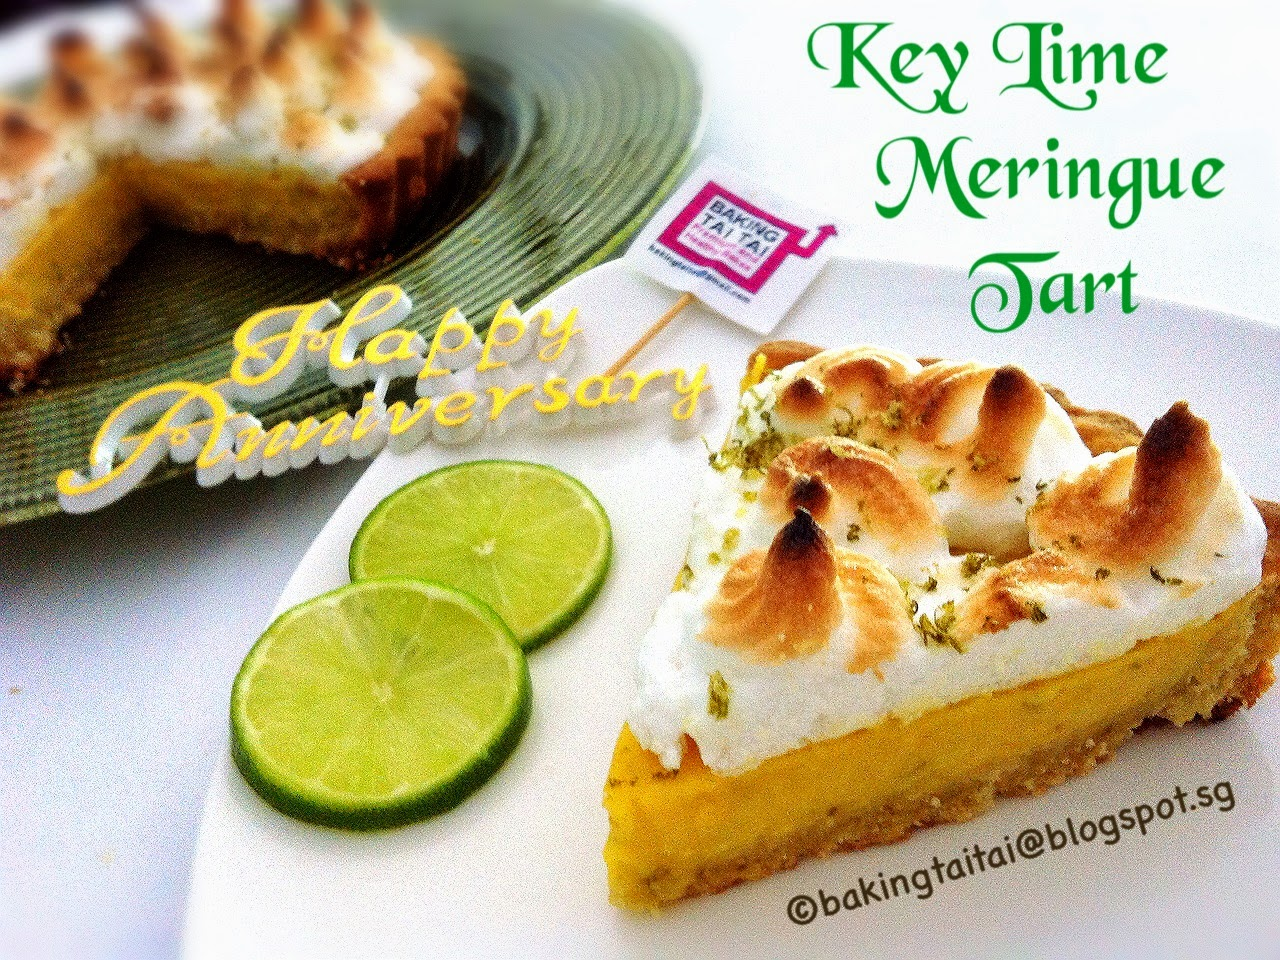 Key Lime Meringue Tart - Blog 1st anniversary 青柠蛋白霜塔 ...